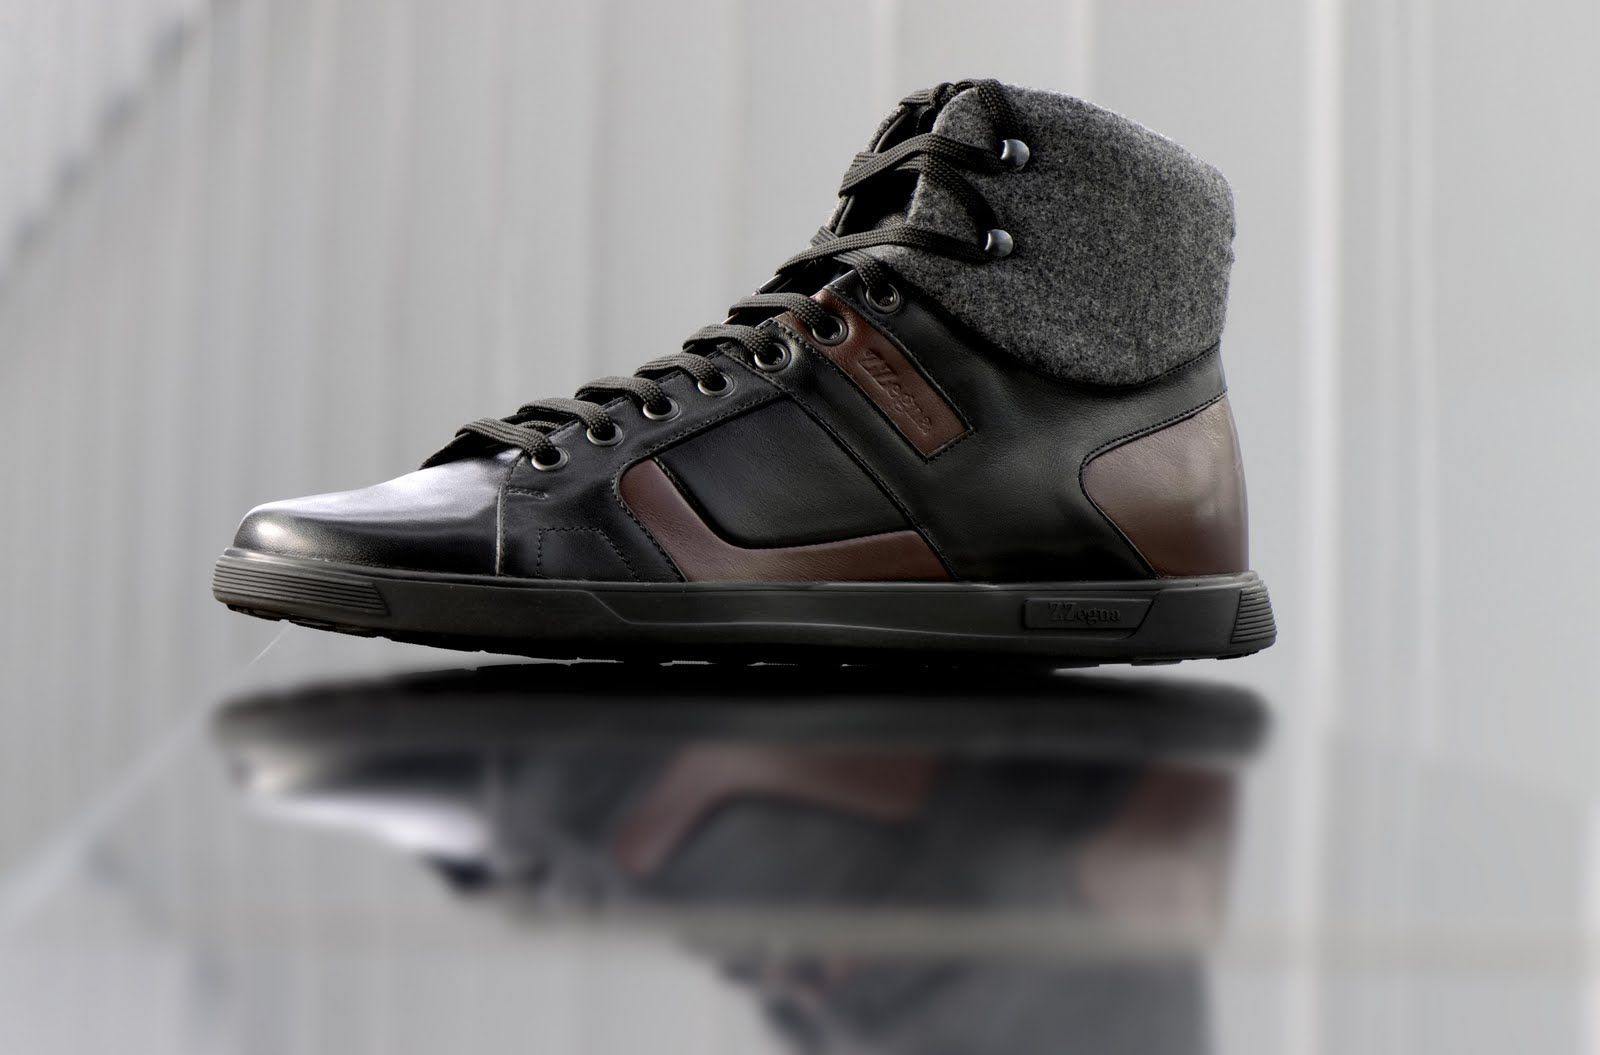 Zegna shoes